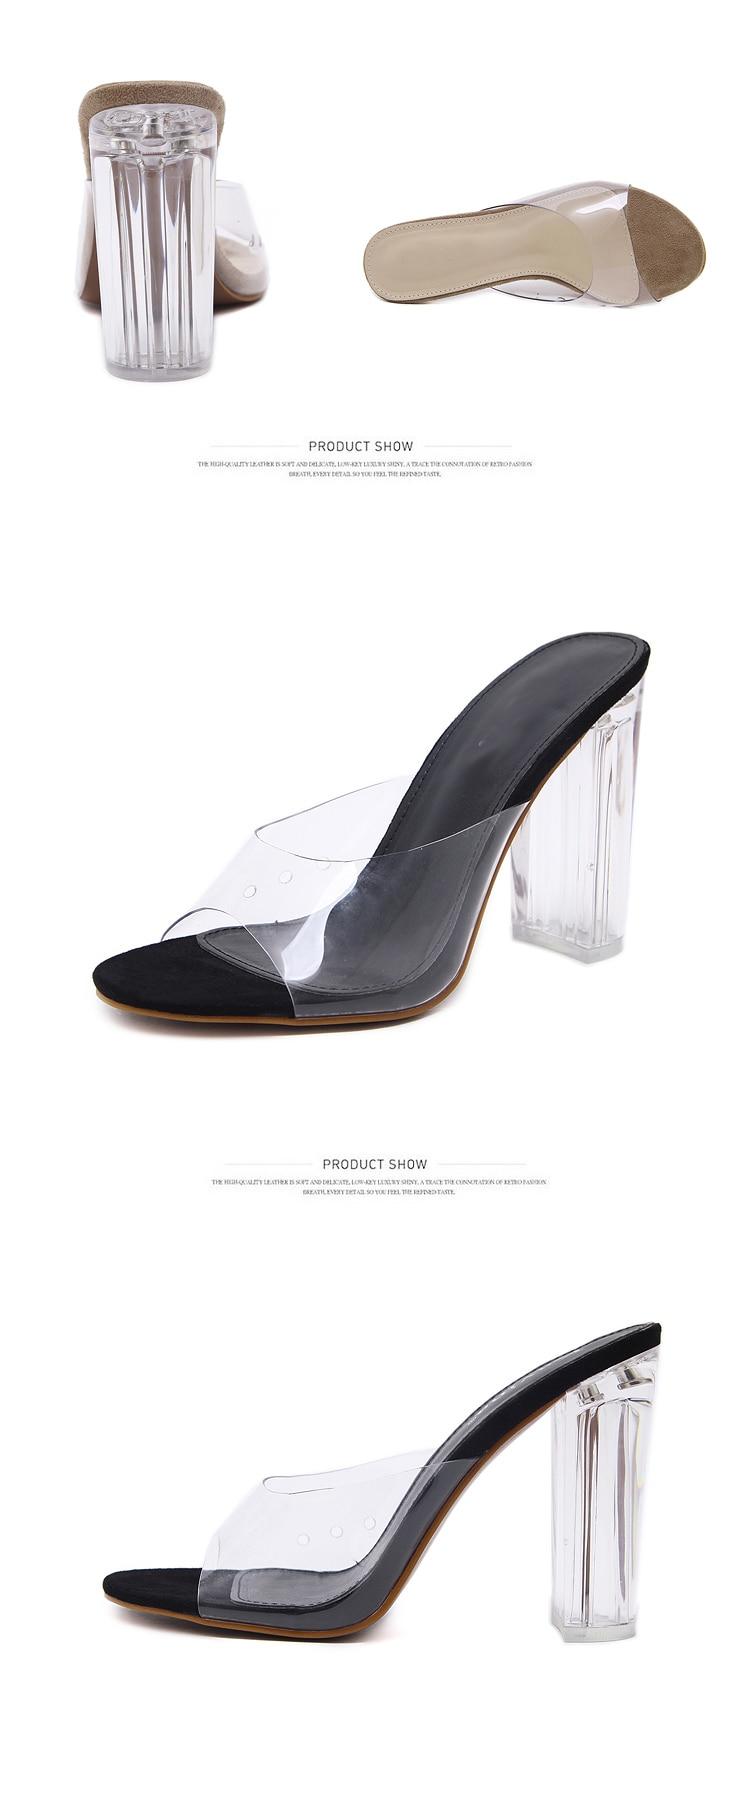 HTB1iXv3oDvI8KJjSspjq6AgjXXaJ Aneikeh New Women Sandals PVC Crystal Heel Transparent Women Sexy Clear High Heels Summer Sandals Pumps Shoes Size 41 42